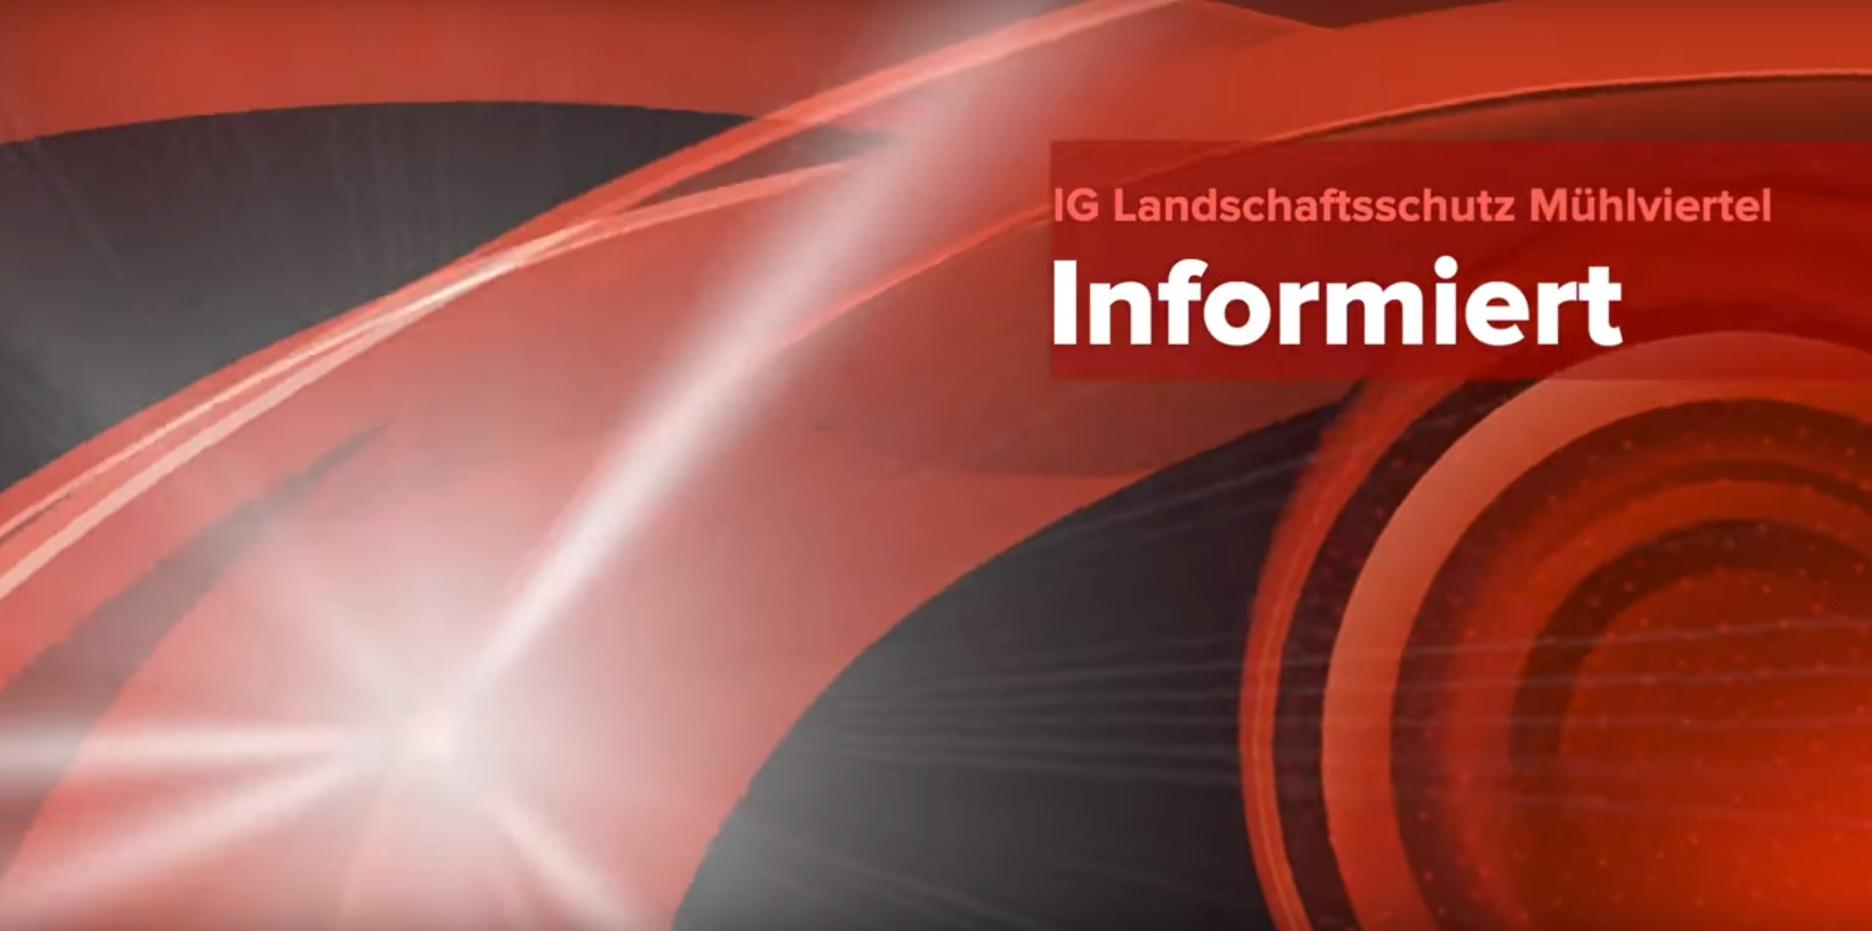 iglm-informiert-1